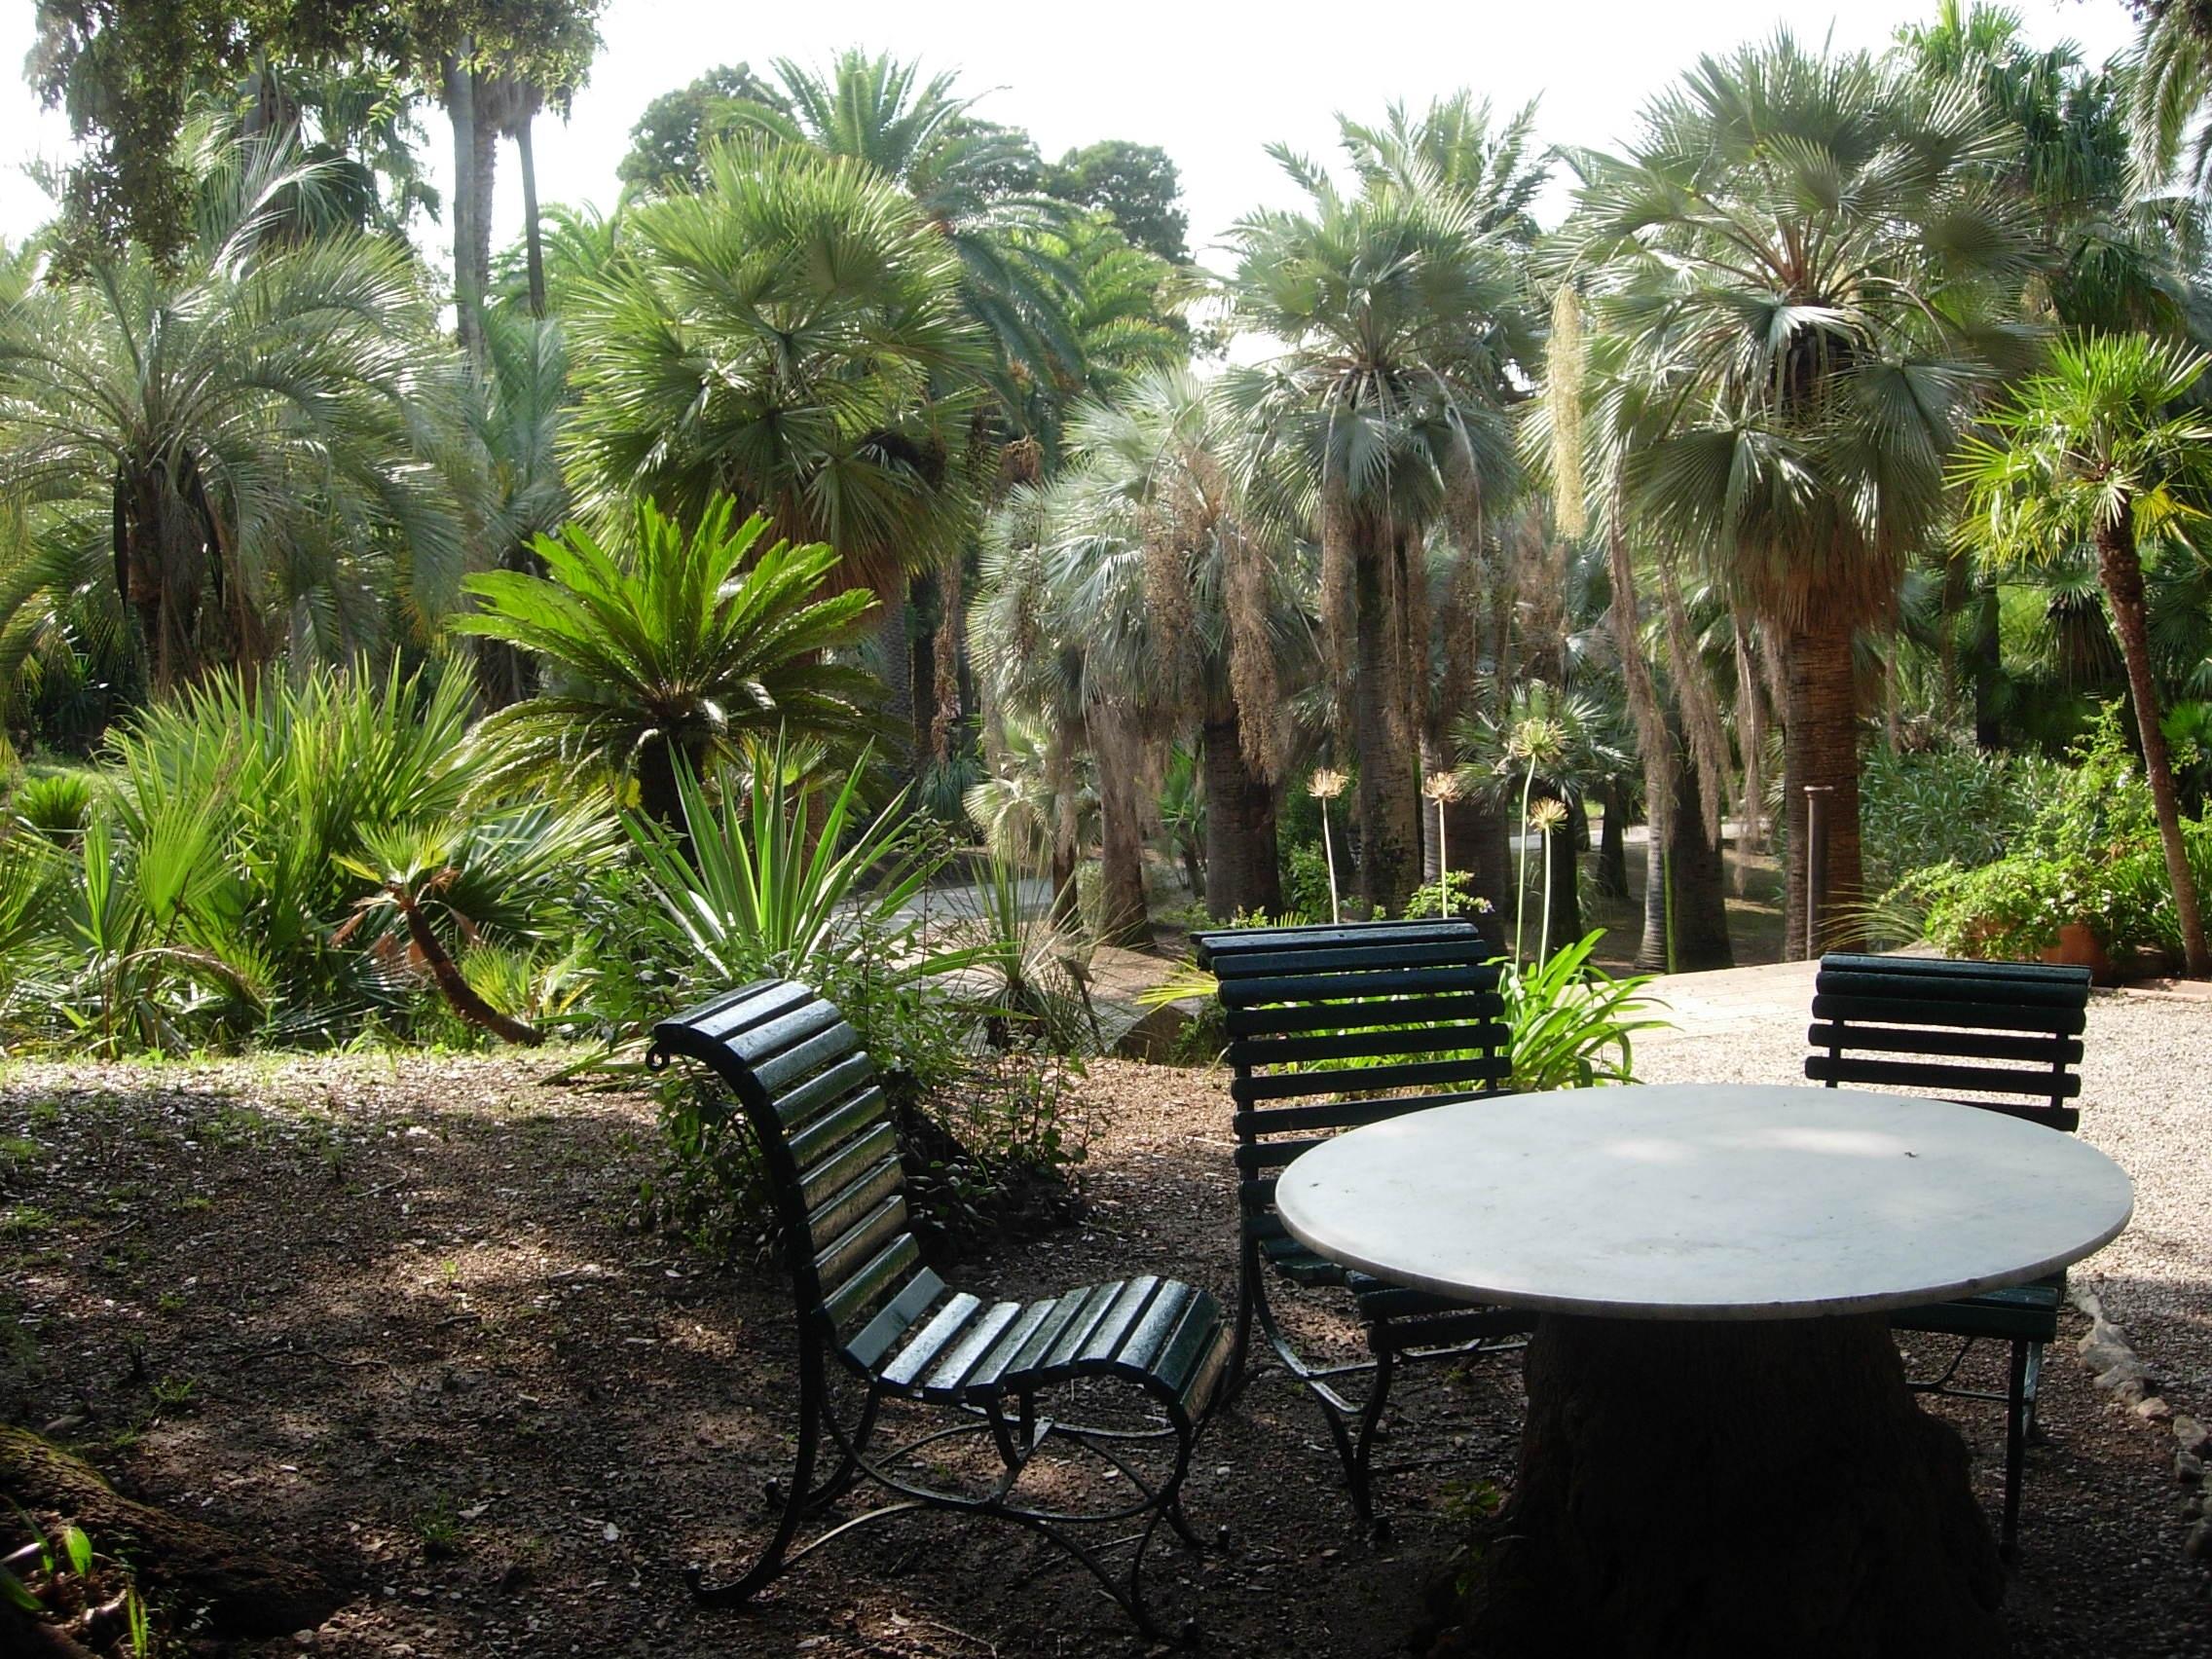 Tree Plant Flower Jungle Backyard Italy Botany Garden Trees Resort  Botanical Garden Estate Yard Palm Trees